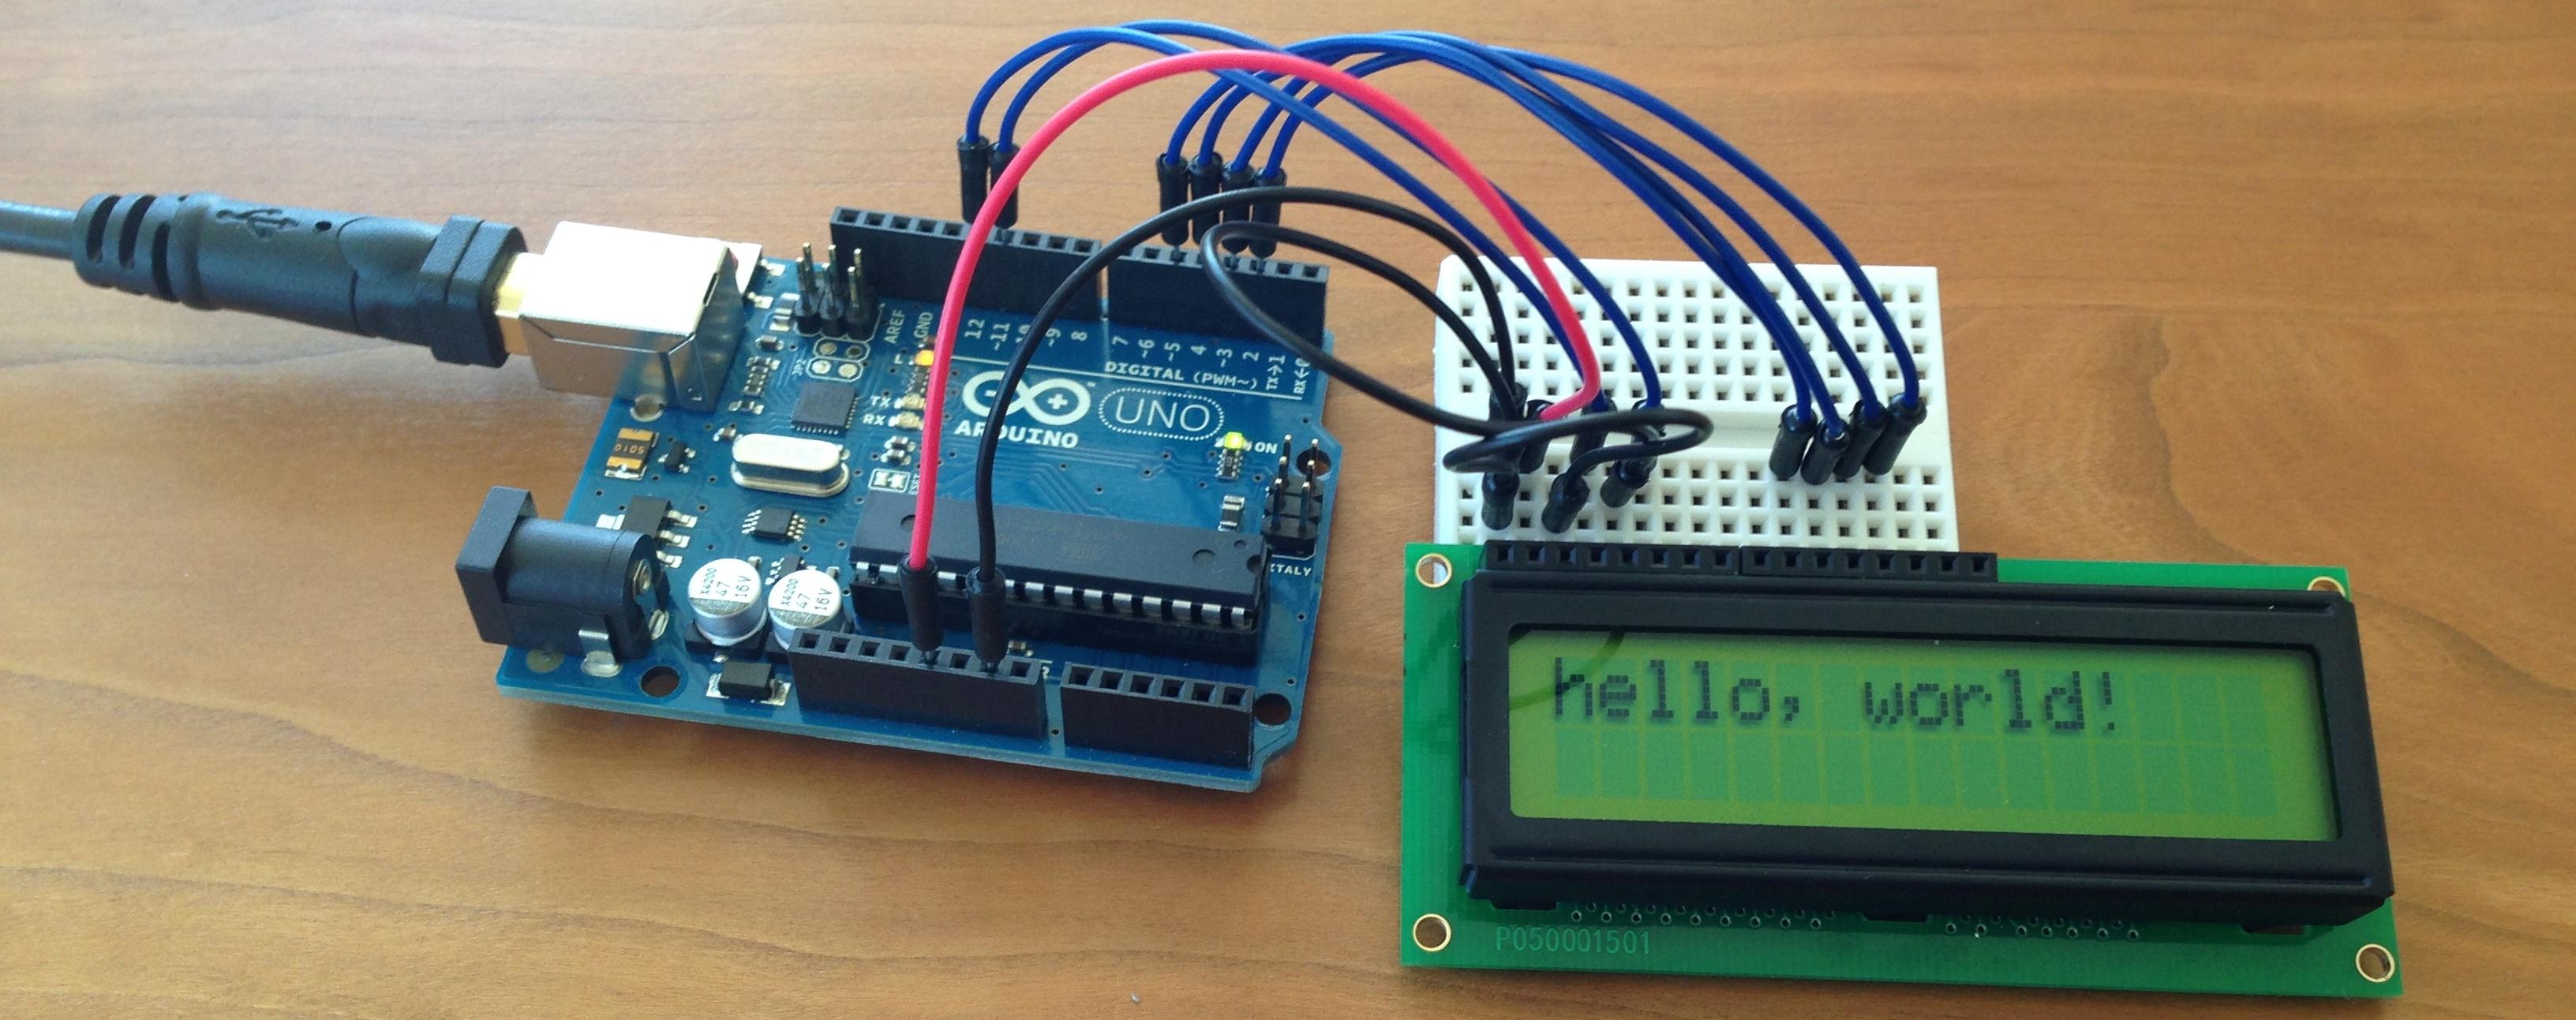 Corso online di Arduino